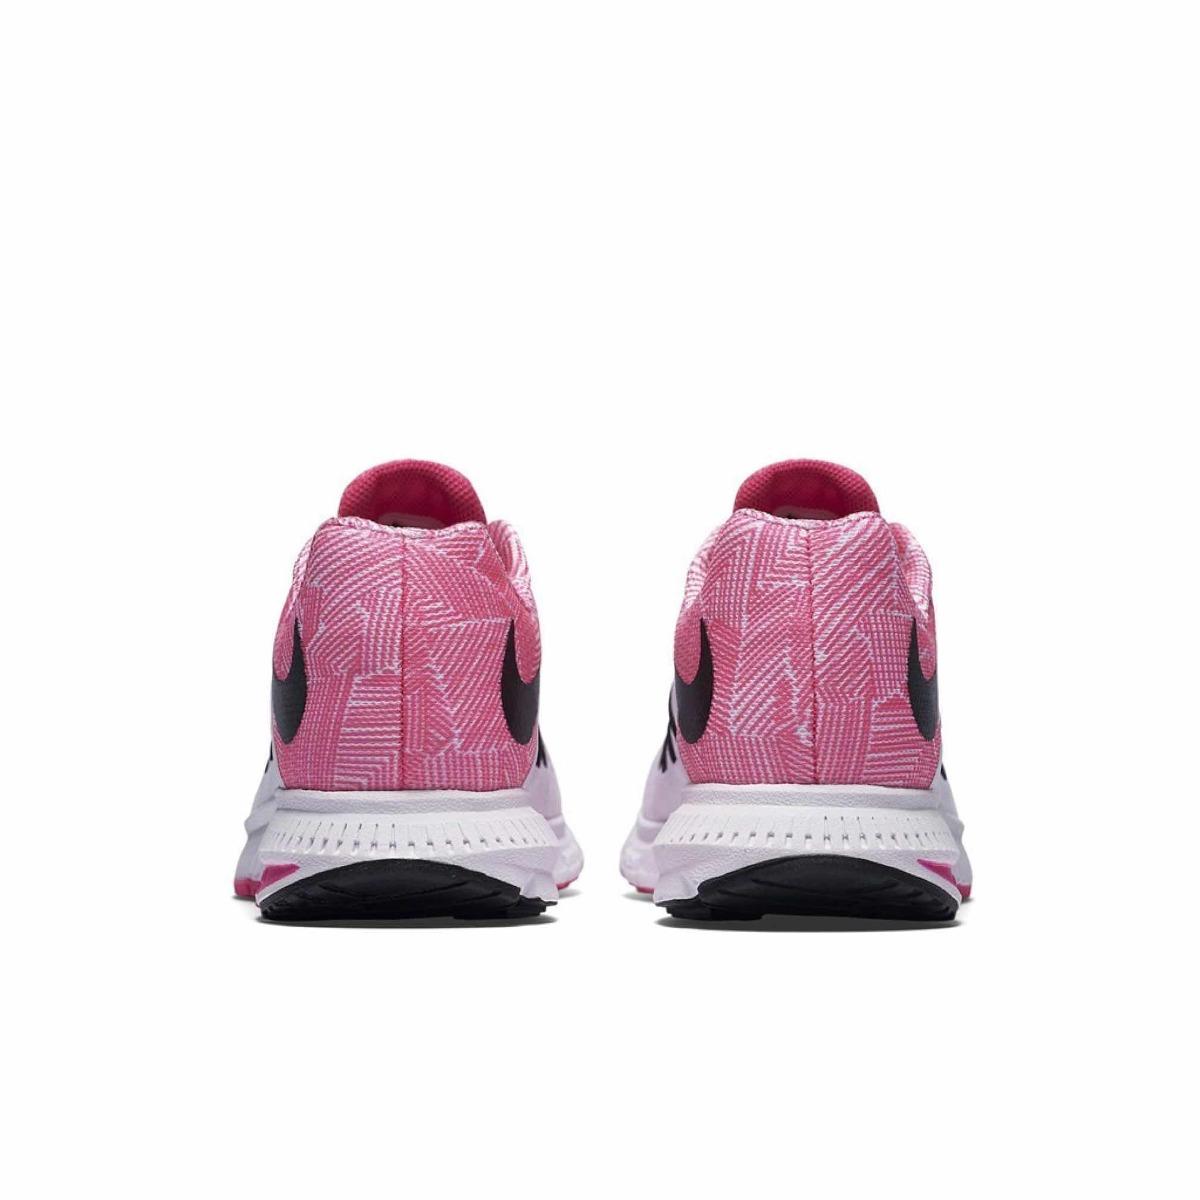 check out 21cb1 74062 tenis nike air zoom winflo 3 premium para dama rosa con nma. Cargando zoom.